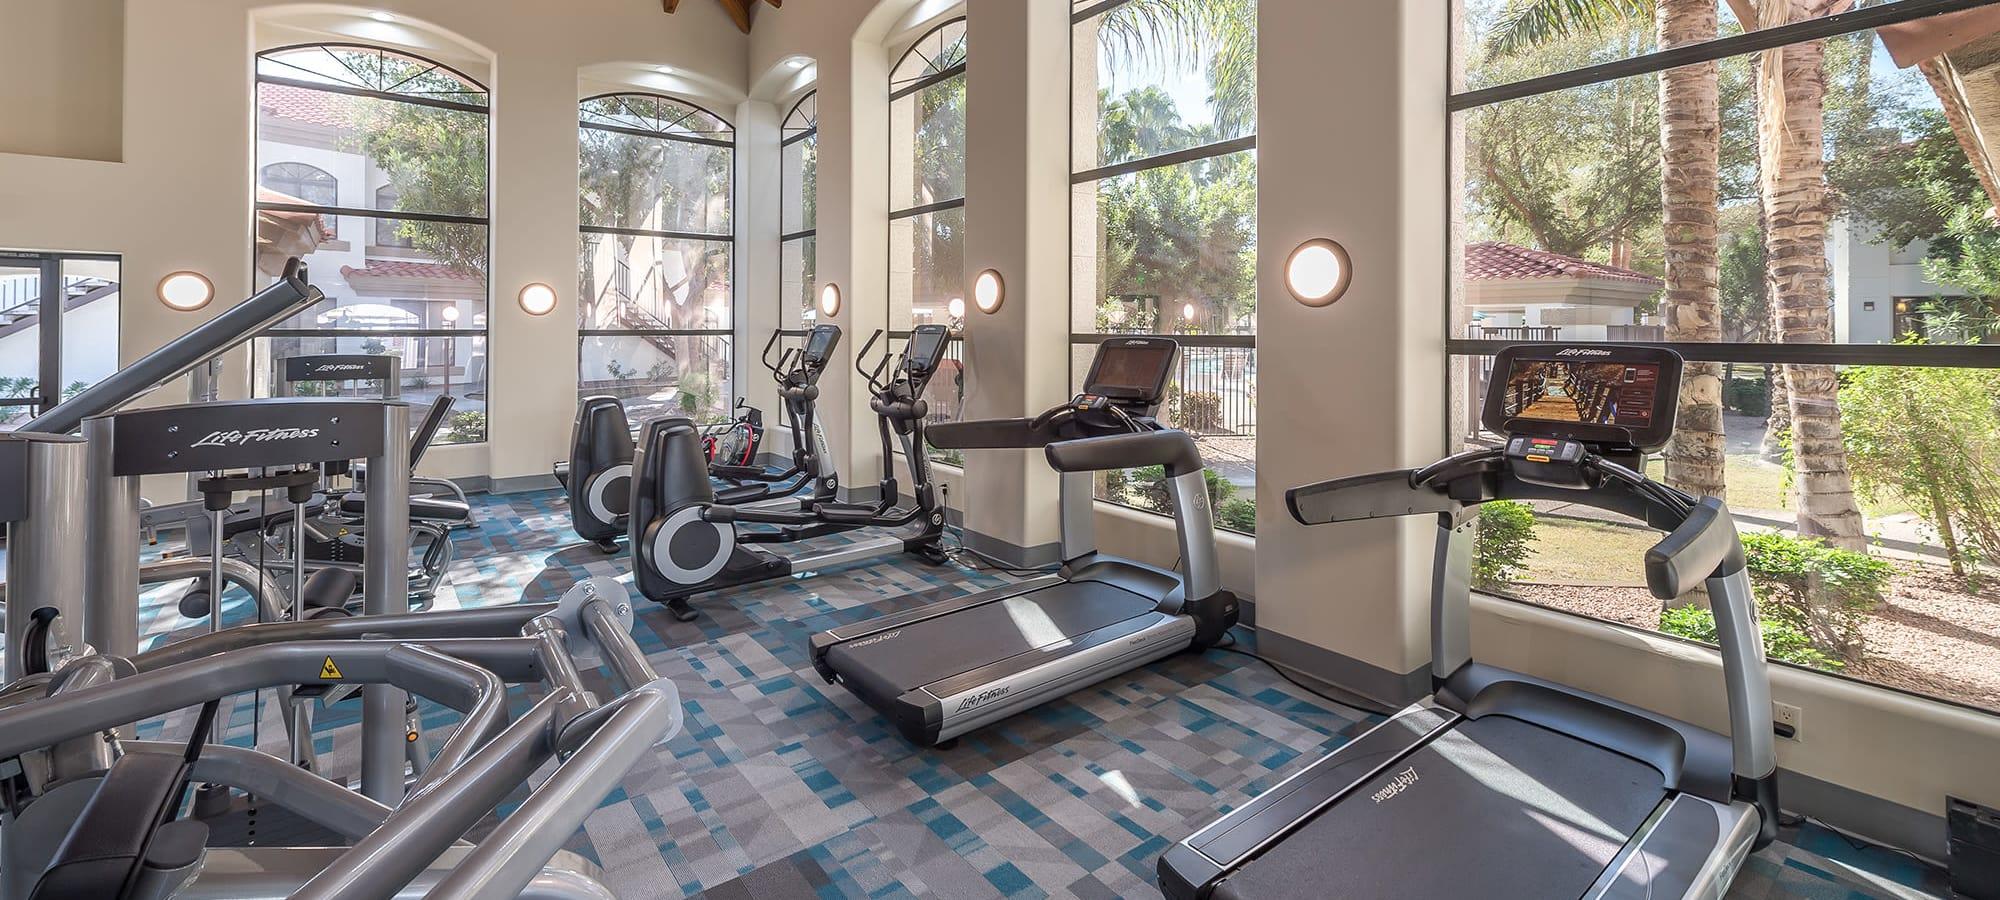 Luxury fitness center at San Palmas in Chandler, Arizona